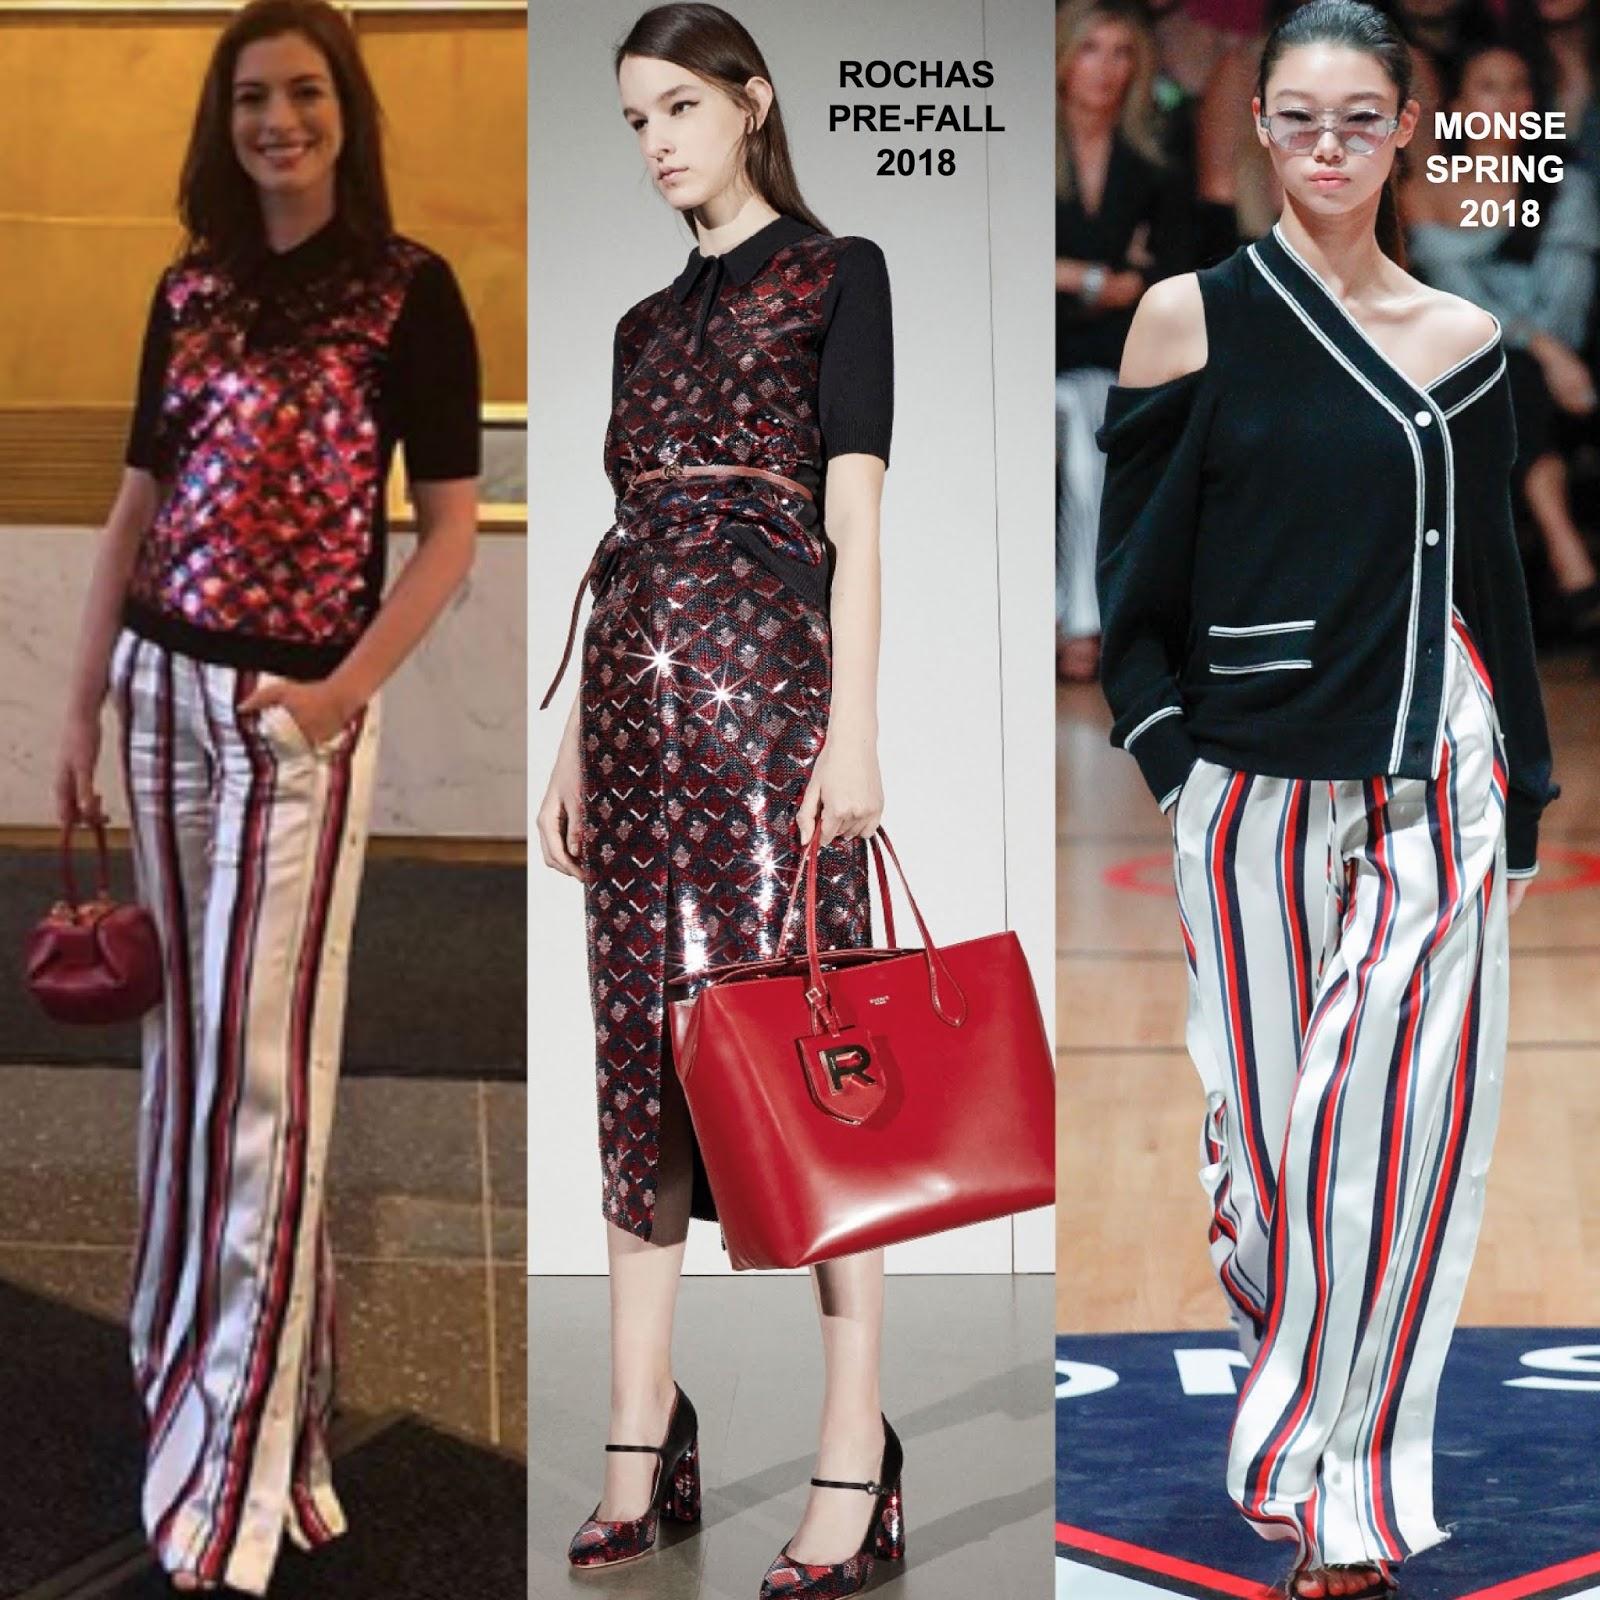 Anne Hathaway Instagram: Instagram Style: Anne Hathaway In Rochas & Monse